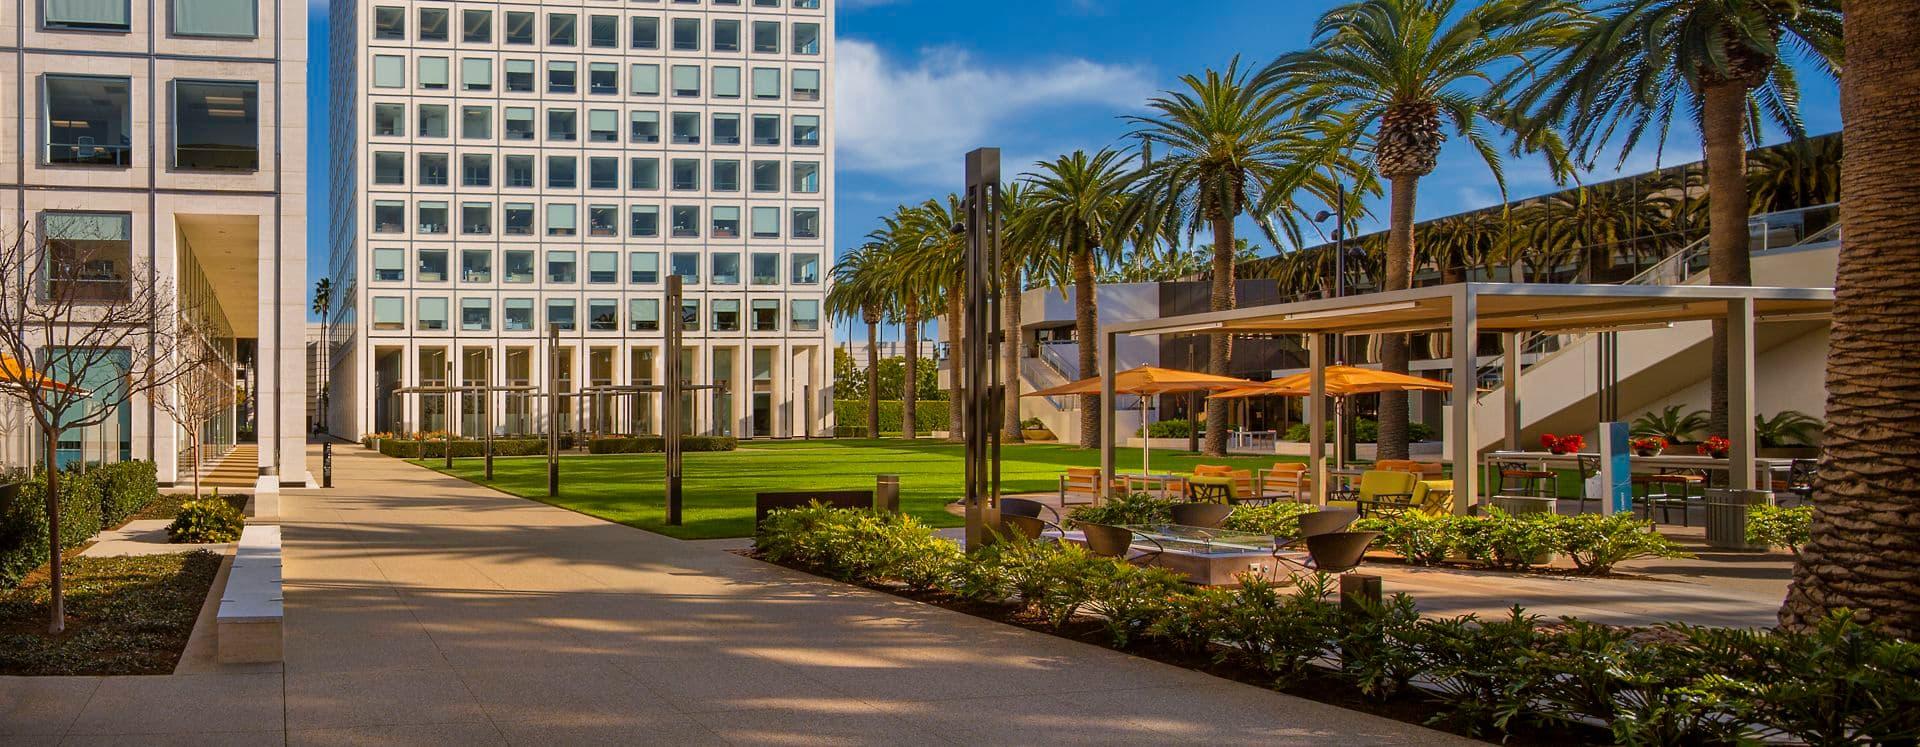 Exterior view of MacArthur Court, in Newport Beach, California.